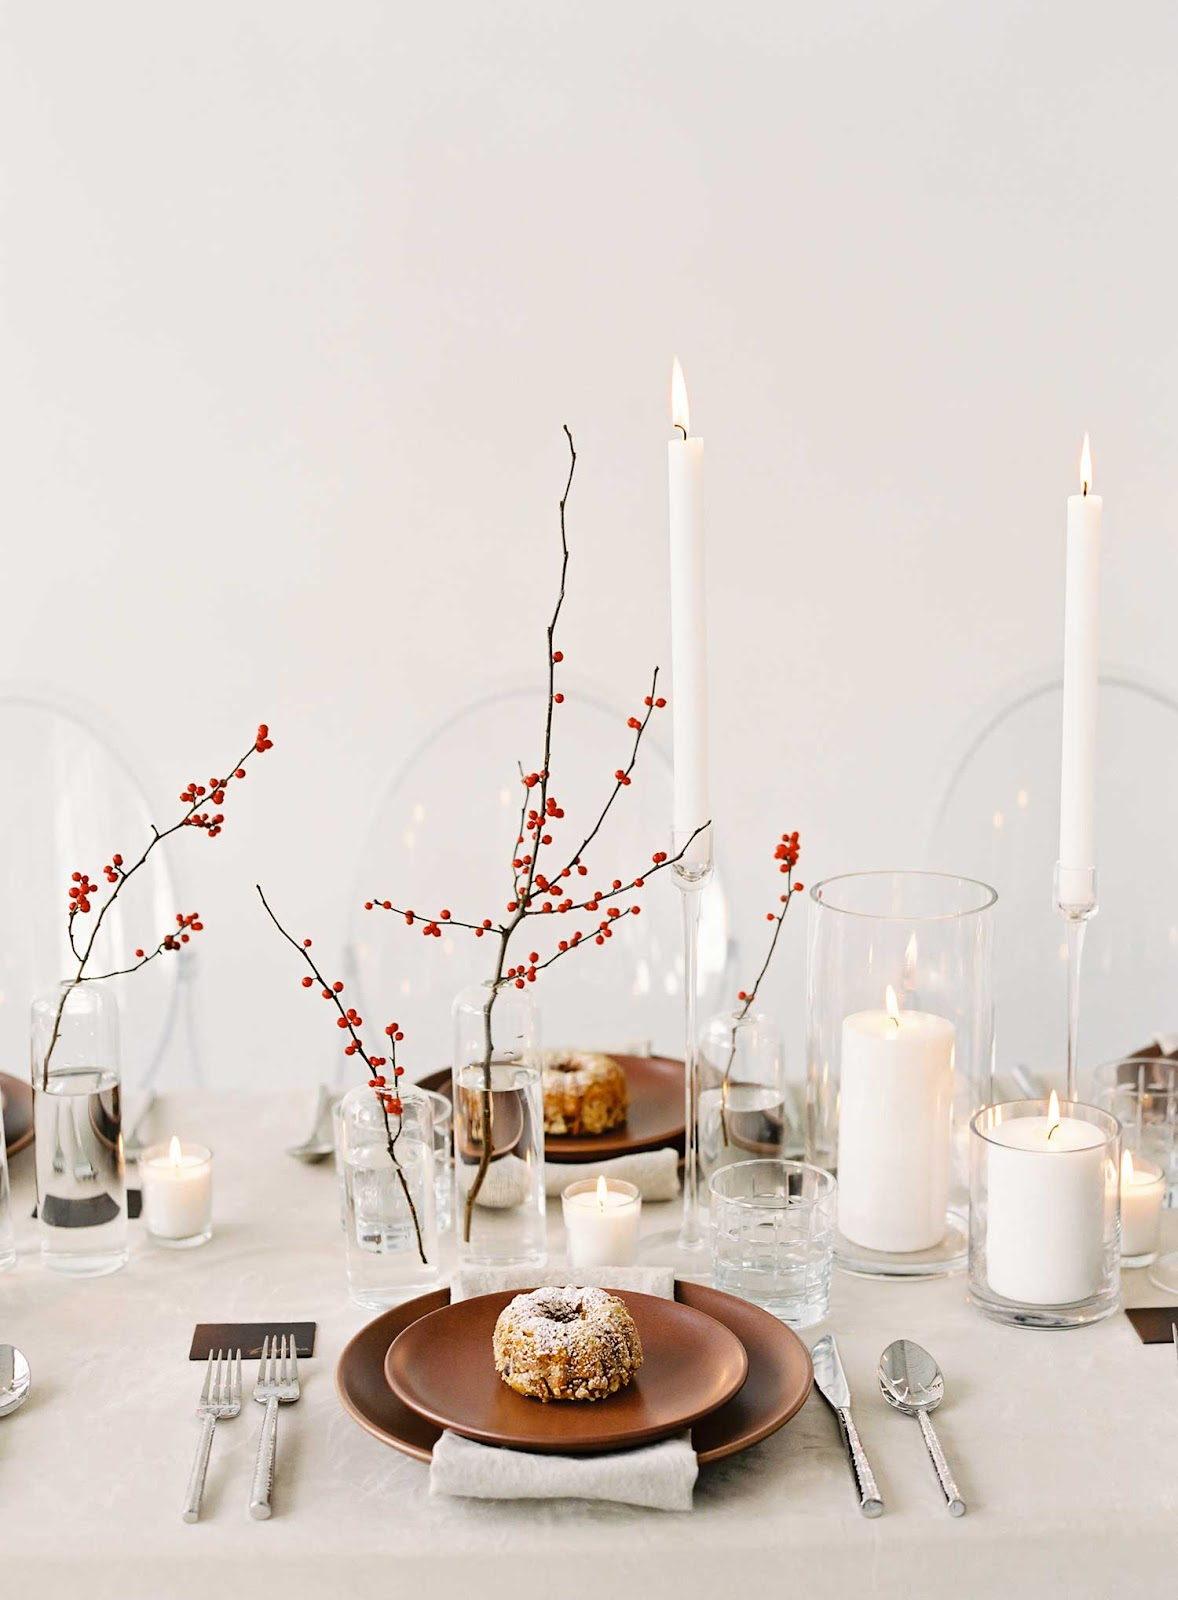 Ideas for styling a unique festive table | Vinterior